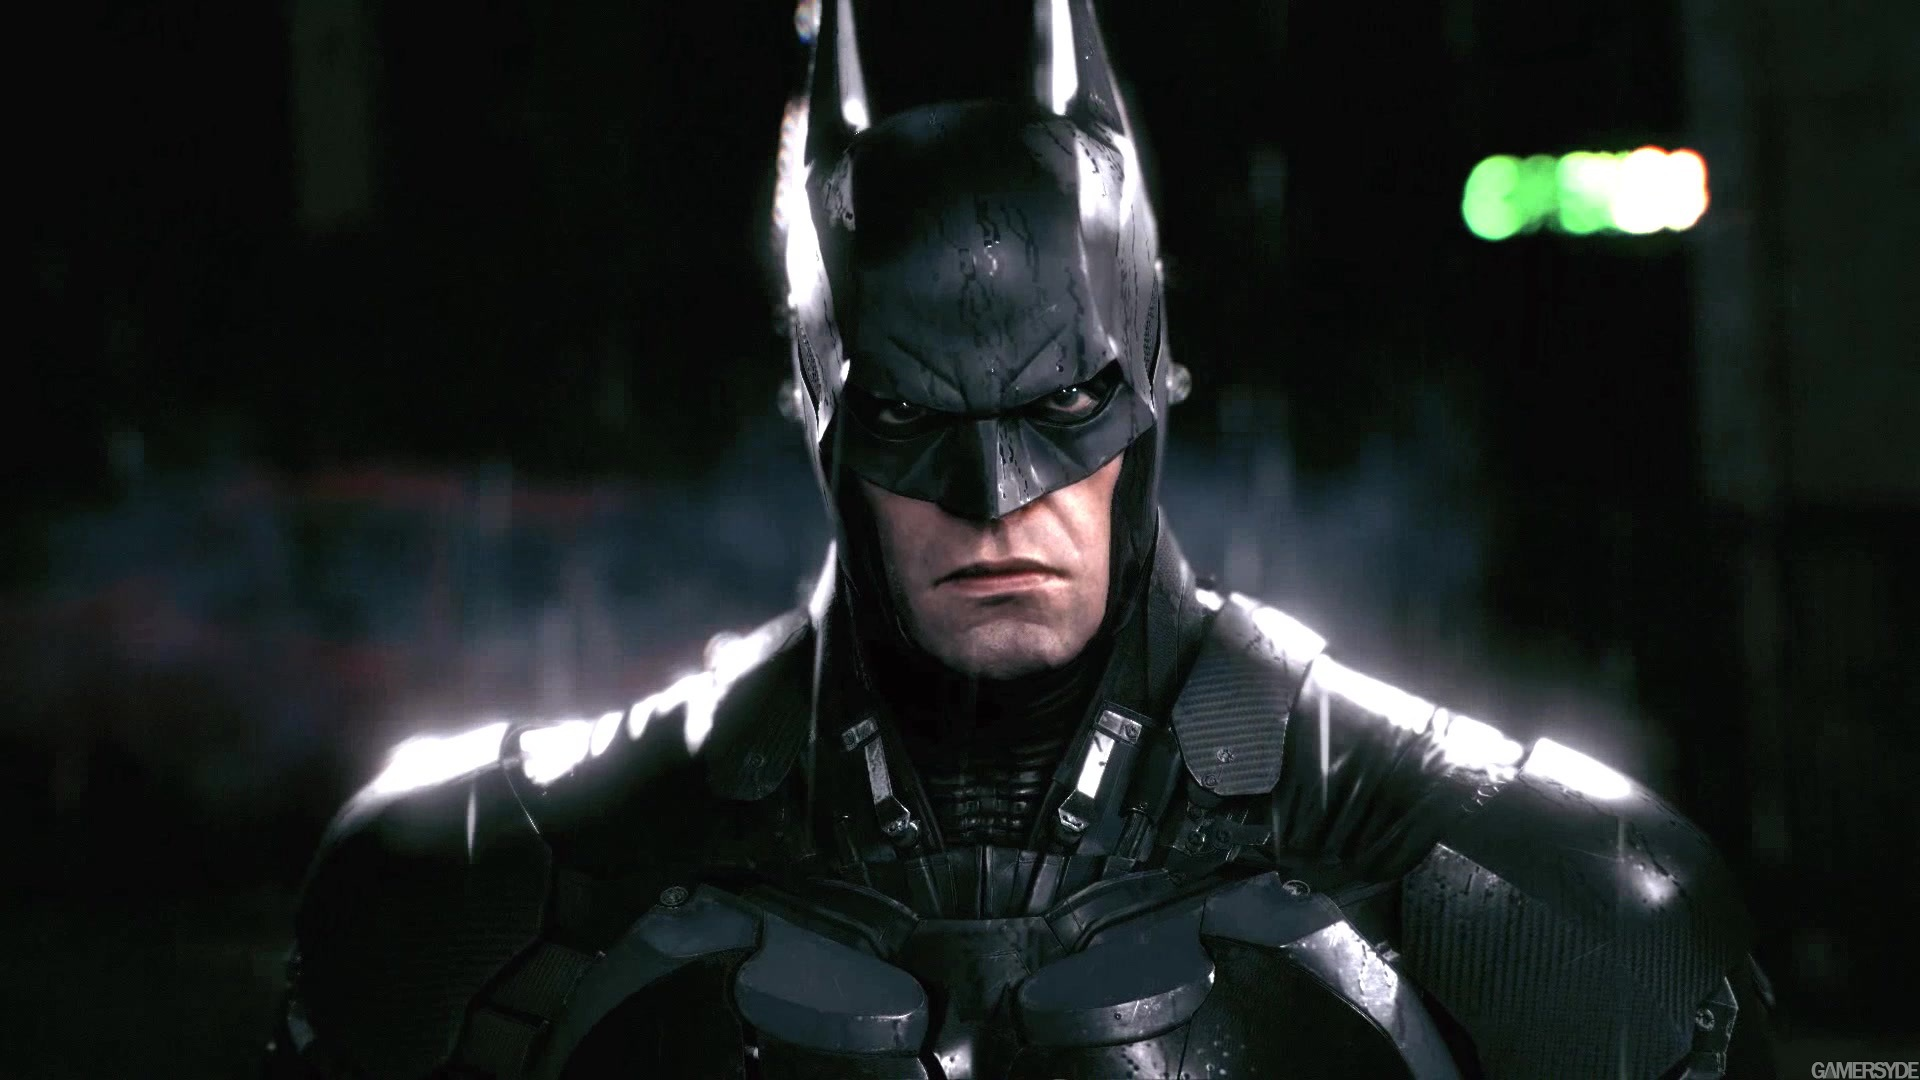 image batman arkham knight 25050 2899 0004 اولین تریلر گیم پلی Batman : Arkham Knight منتشر شد : حماسه ی نهایی